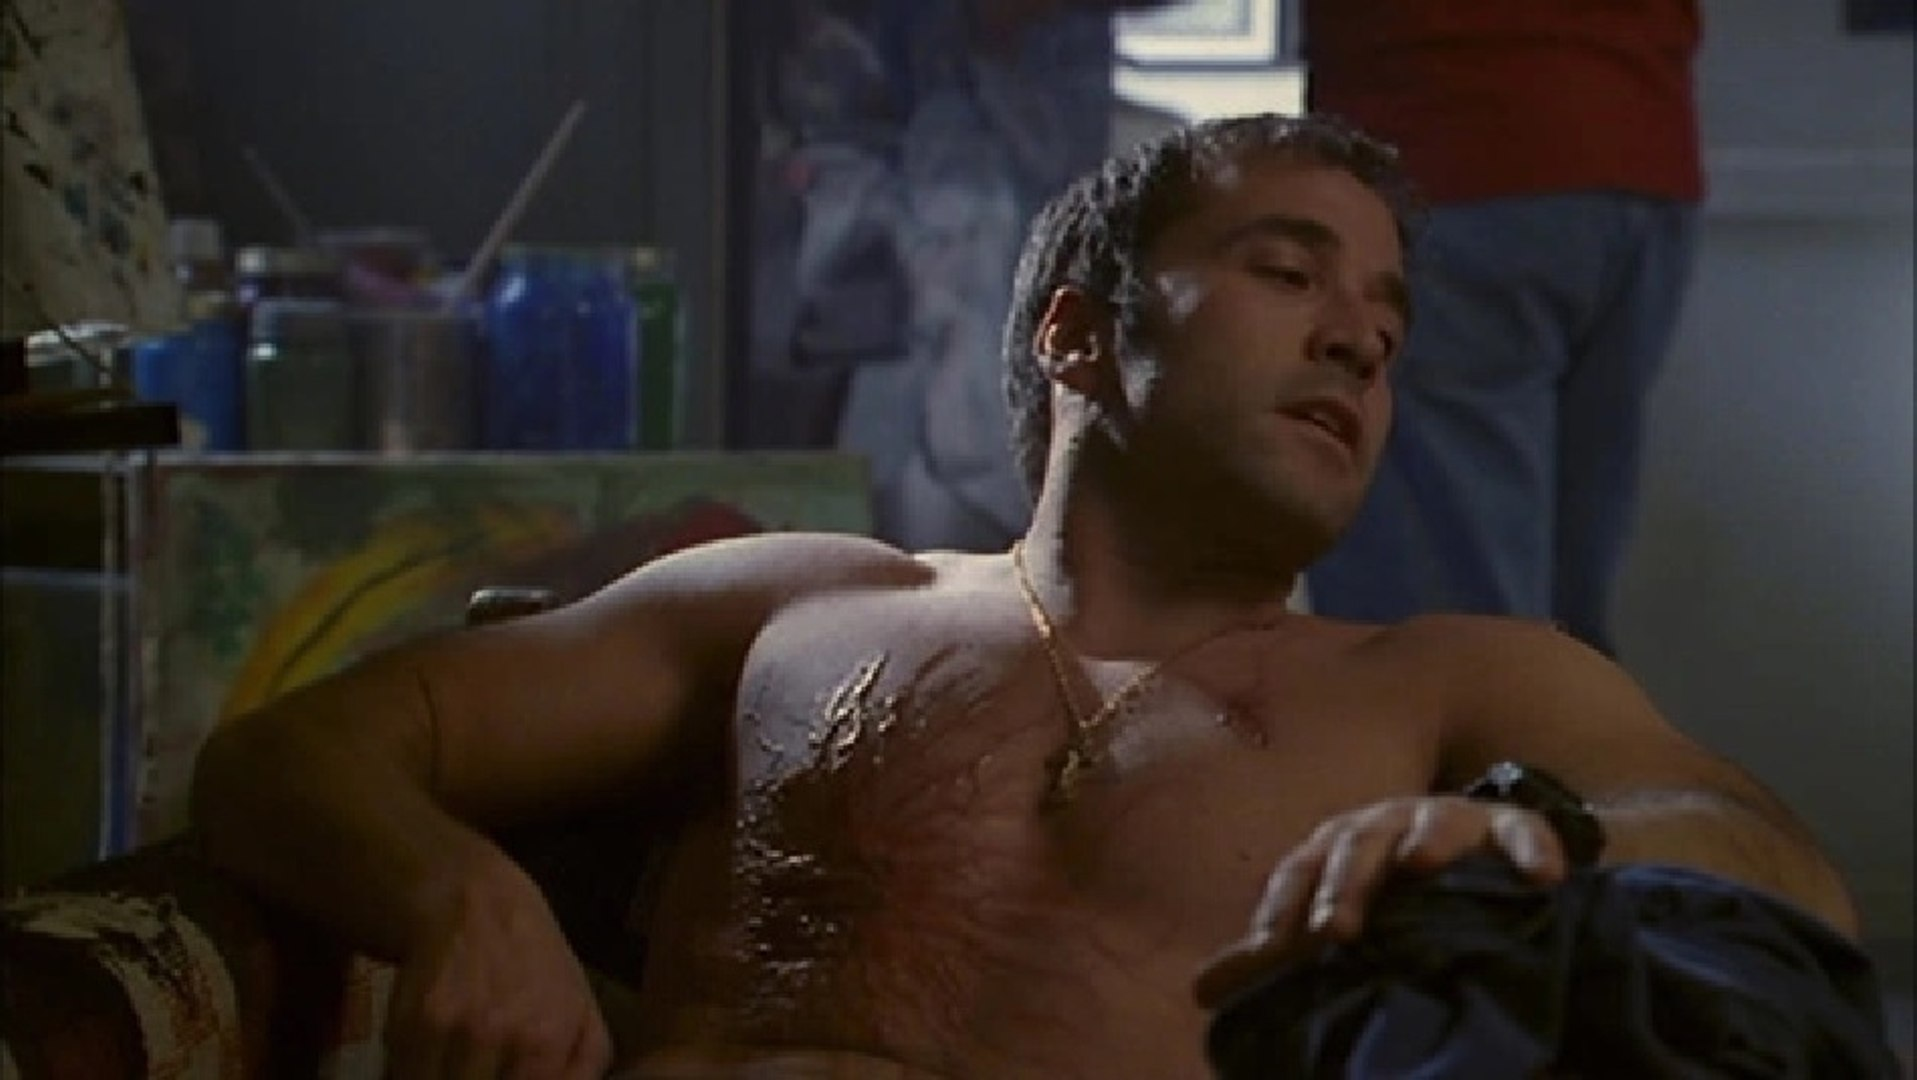 The Twilight Zone (2002) - 11 & 12 - The Lineman (vietsub)